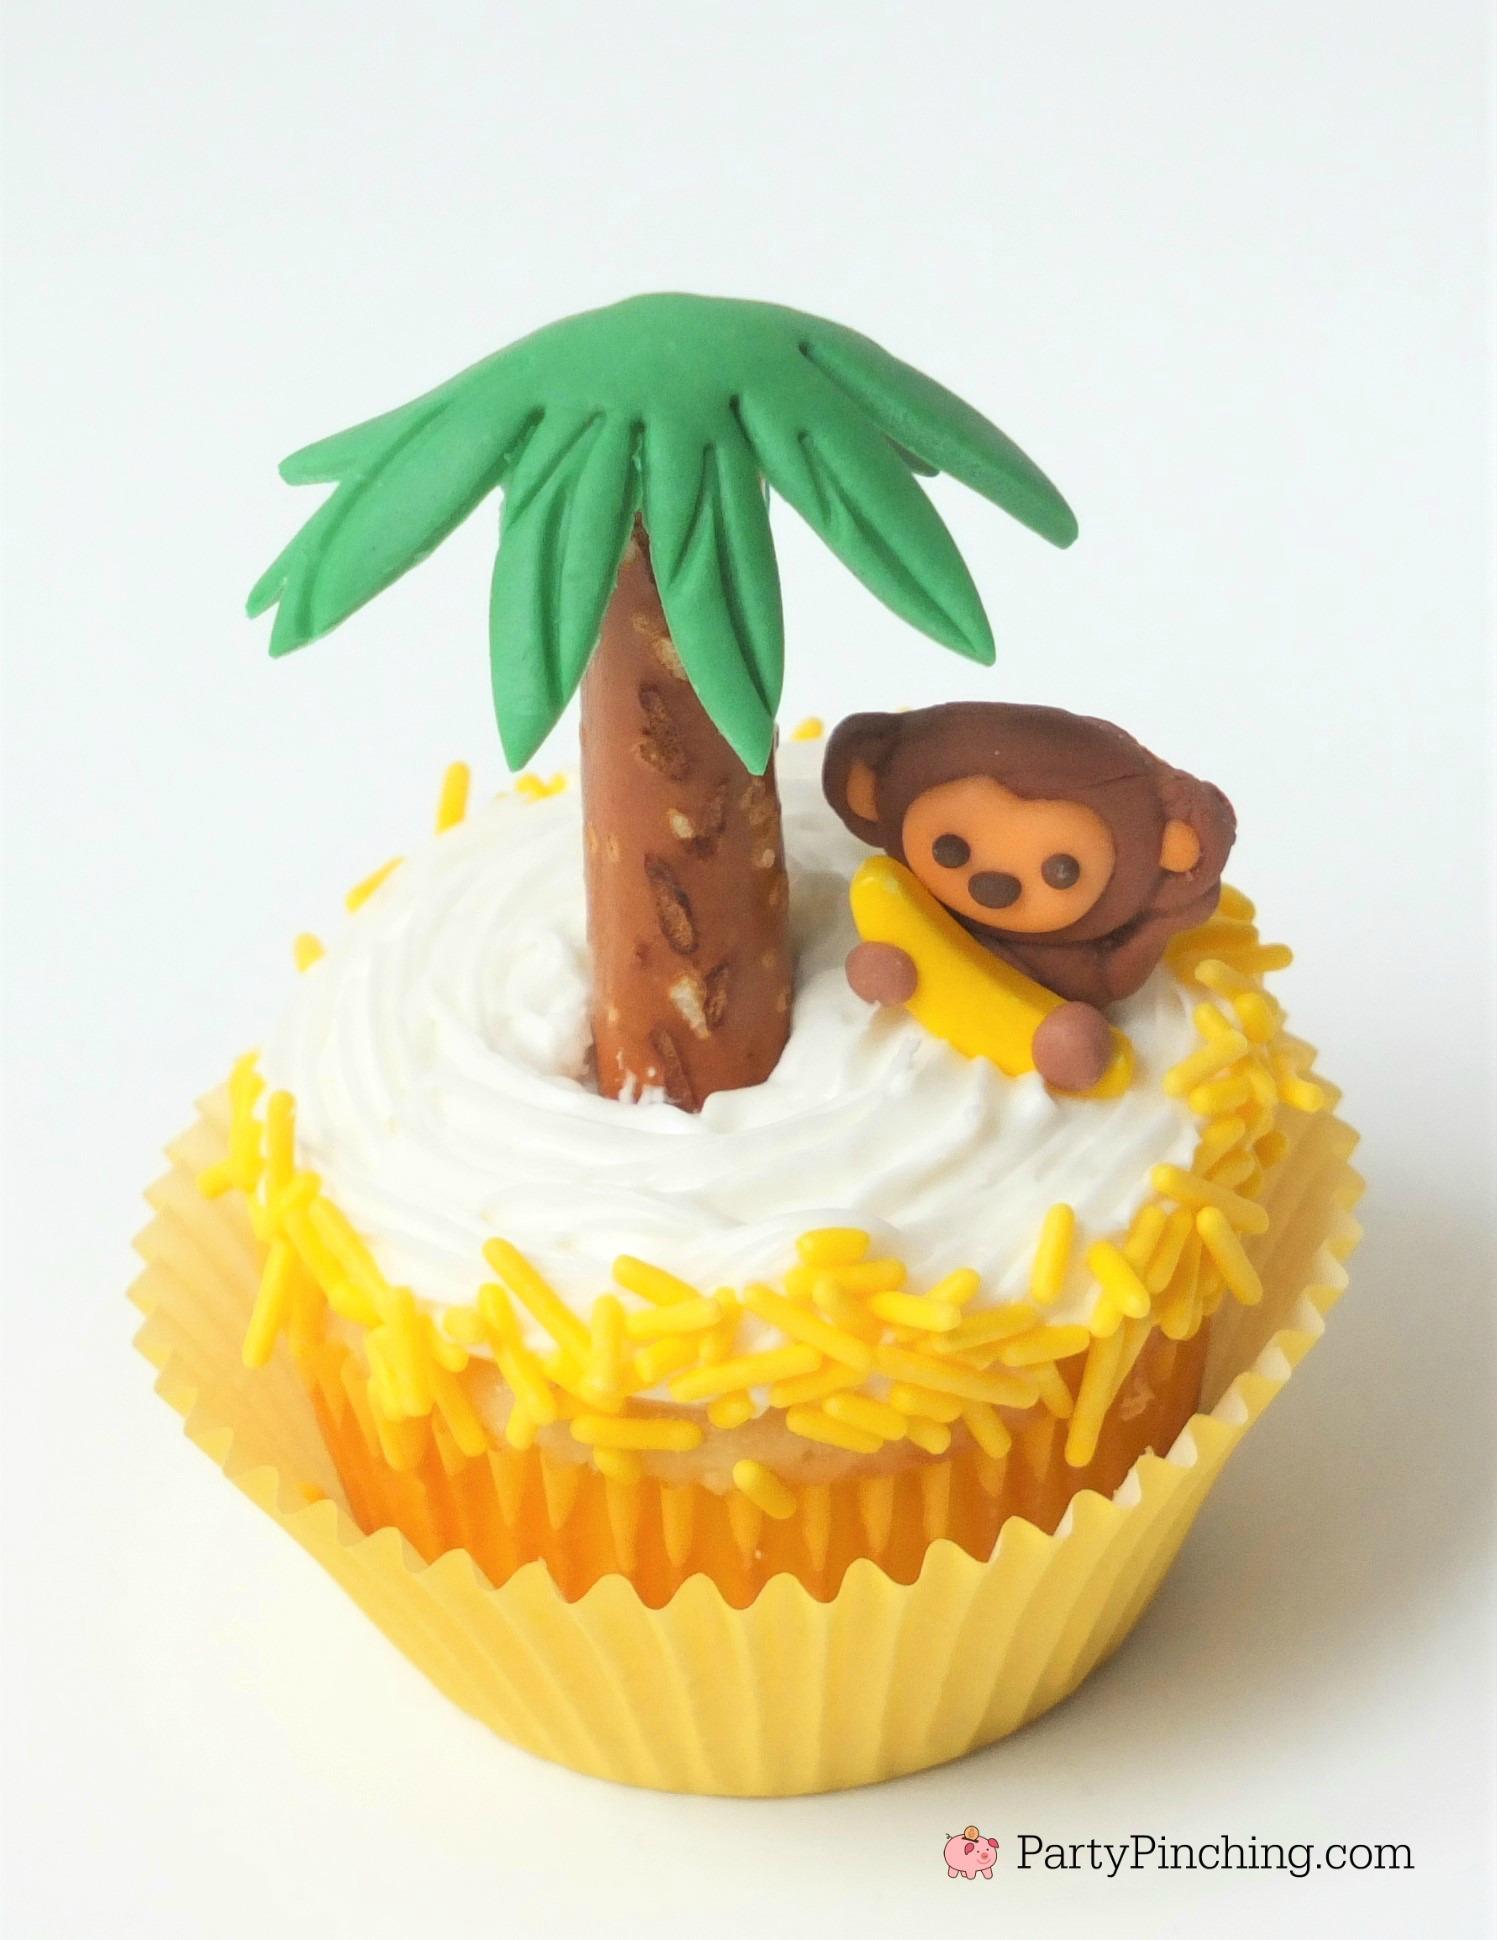 monkey cupcakes, safari jungle party ideas, cute adorable cupcakes for kids, fun food, sweet treats for birthday, monkey banana cupcake with pretzel palm tree